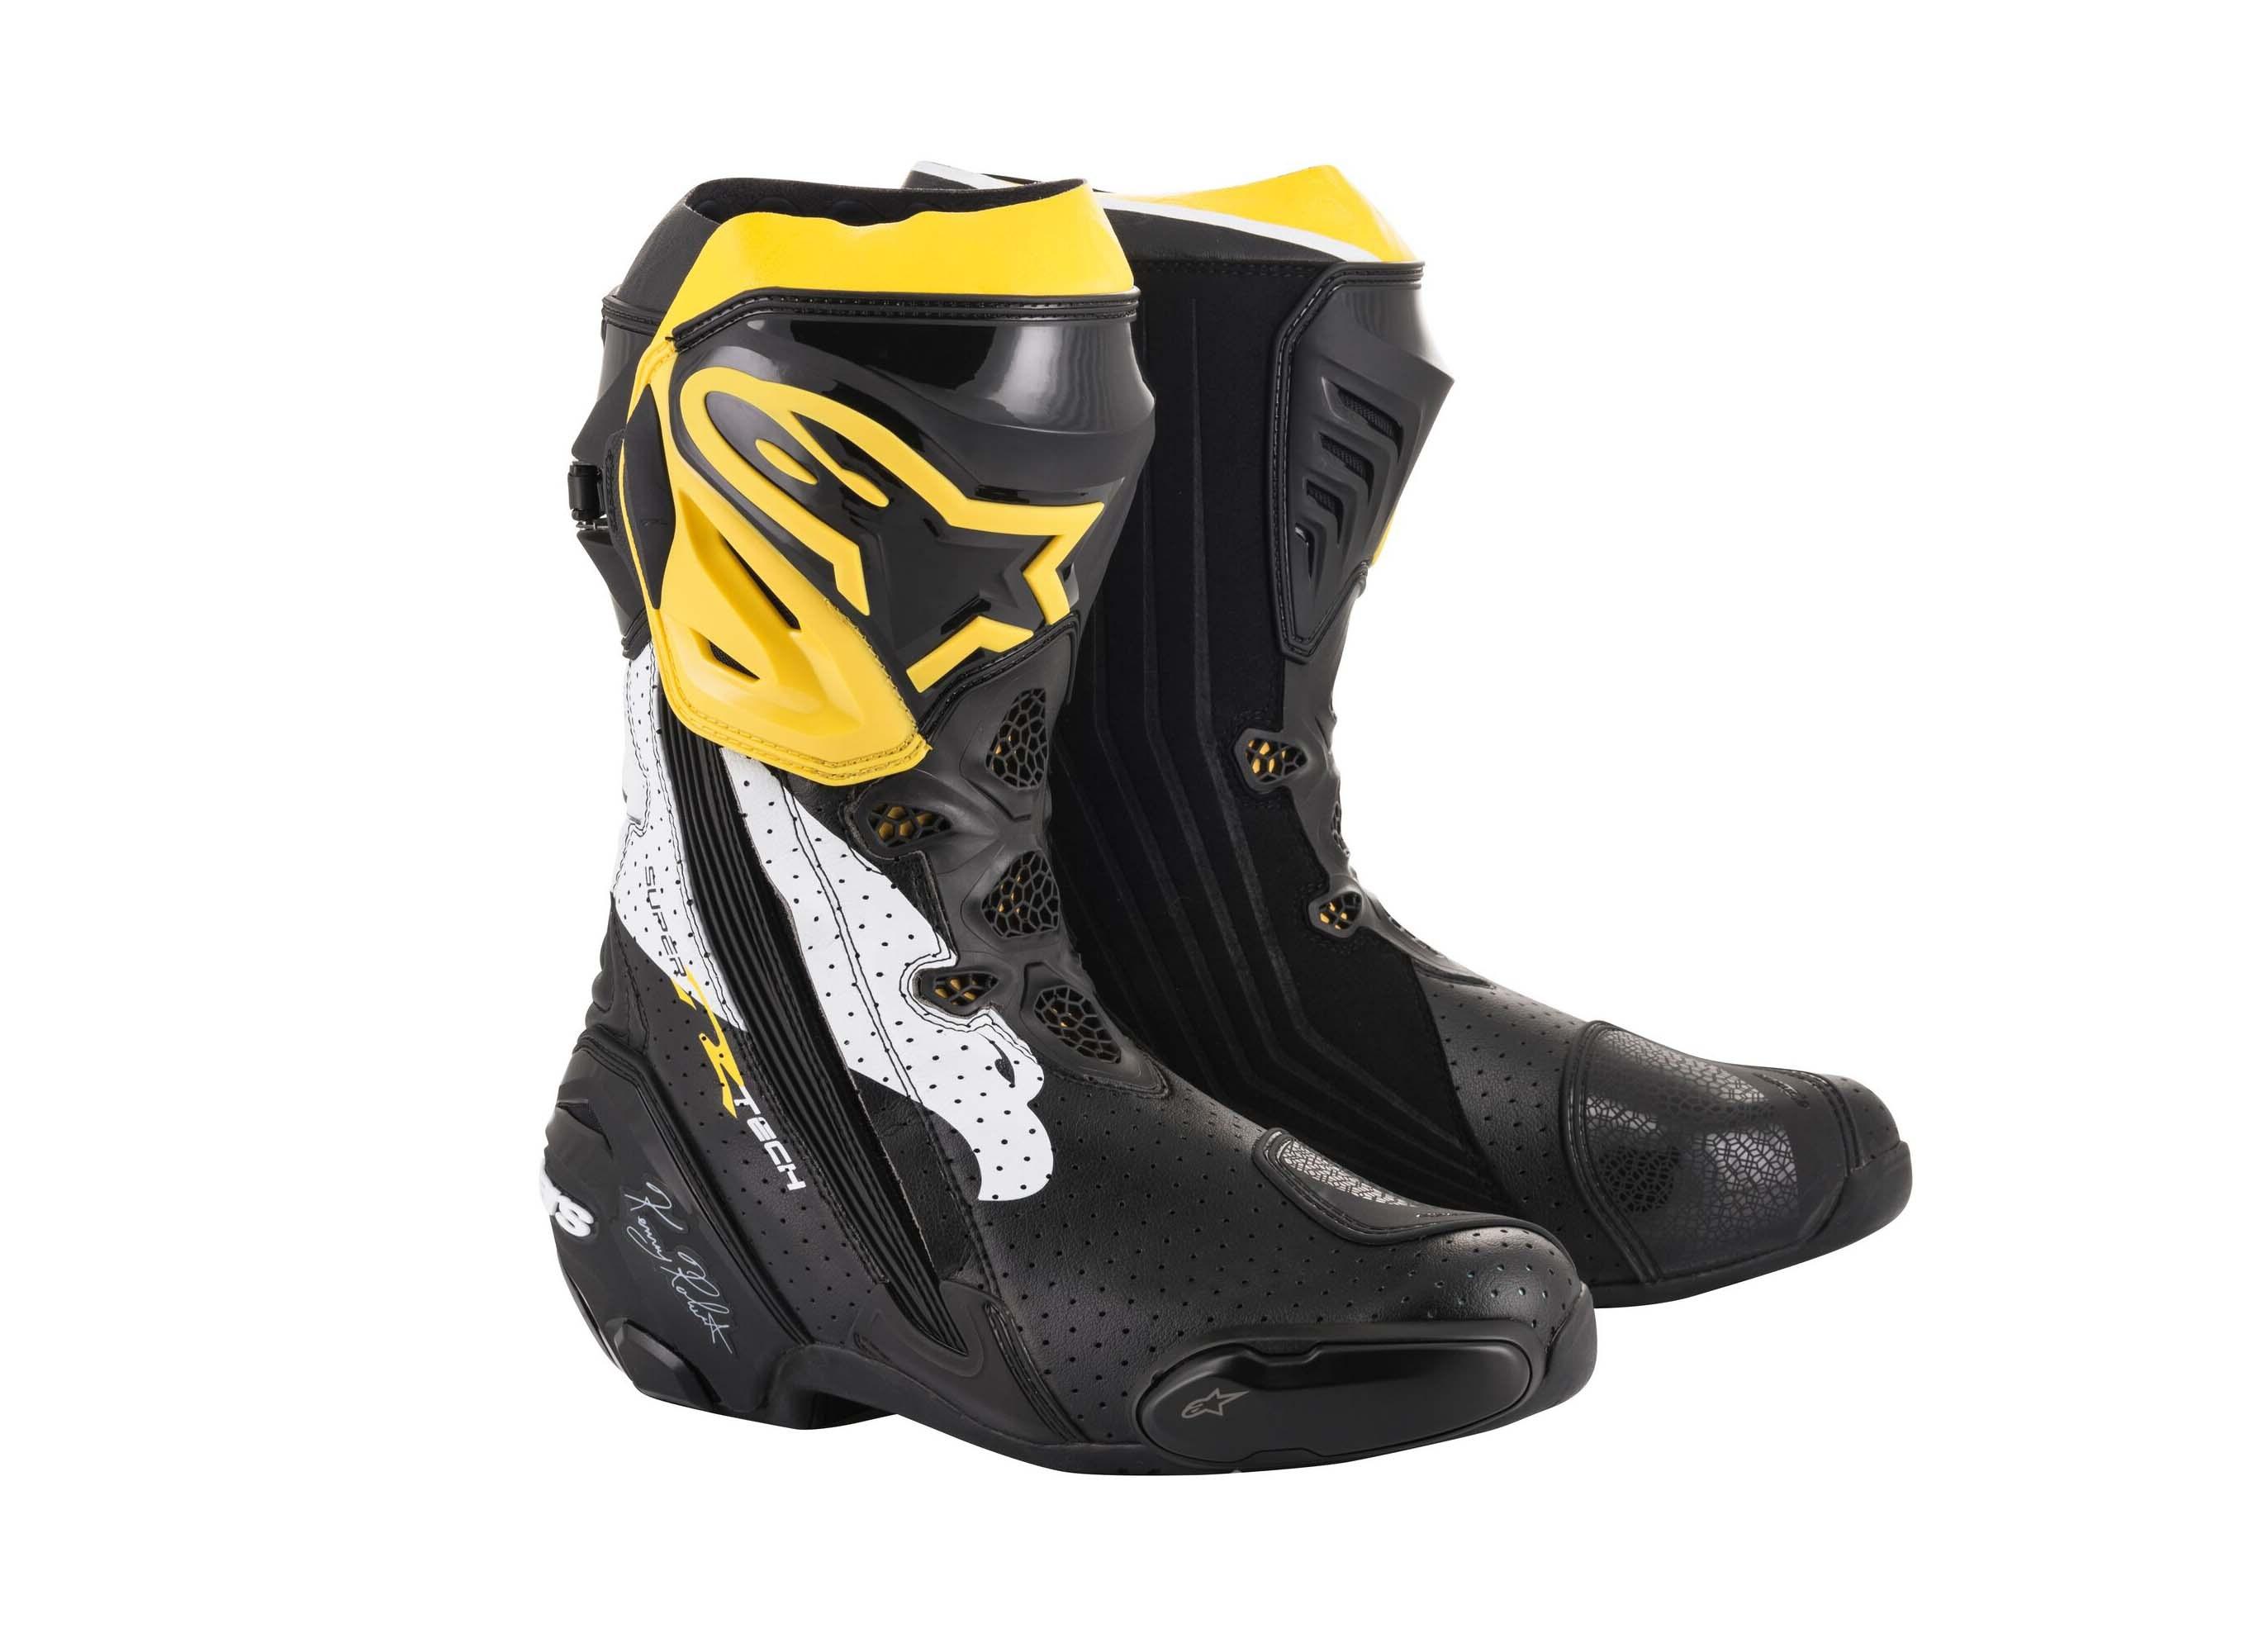 Alpinestars-Supertech-R-Boots-Kenny-Roberts-Sr-01